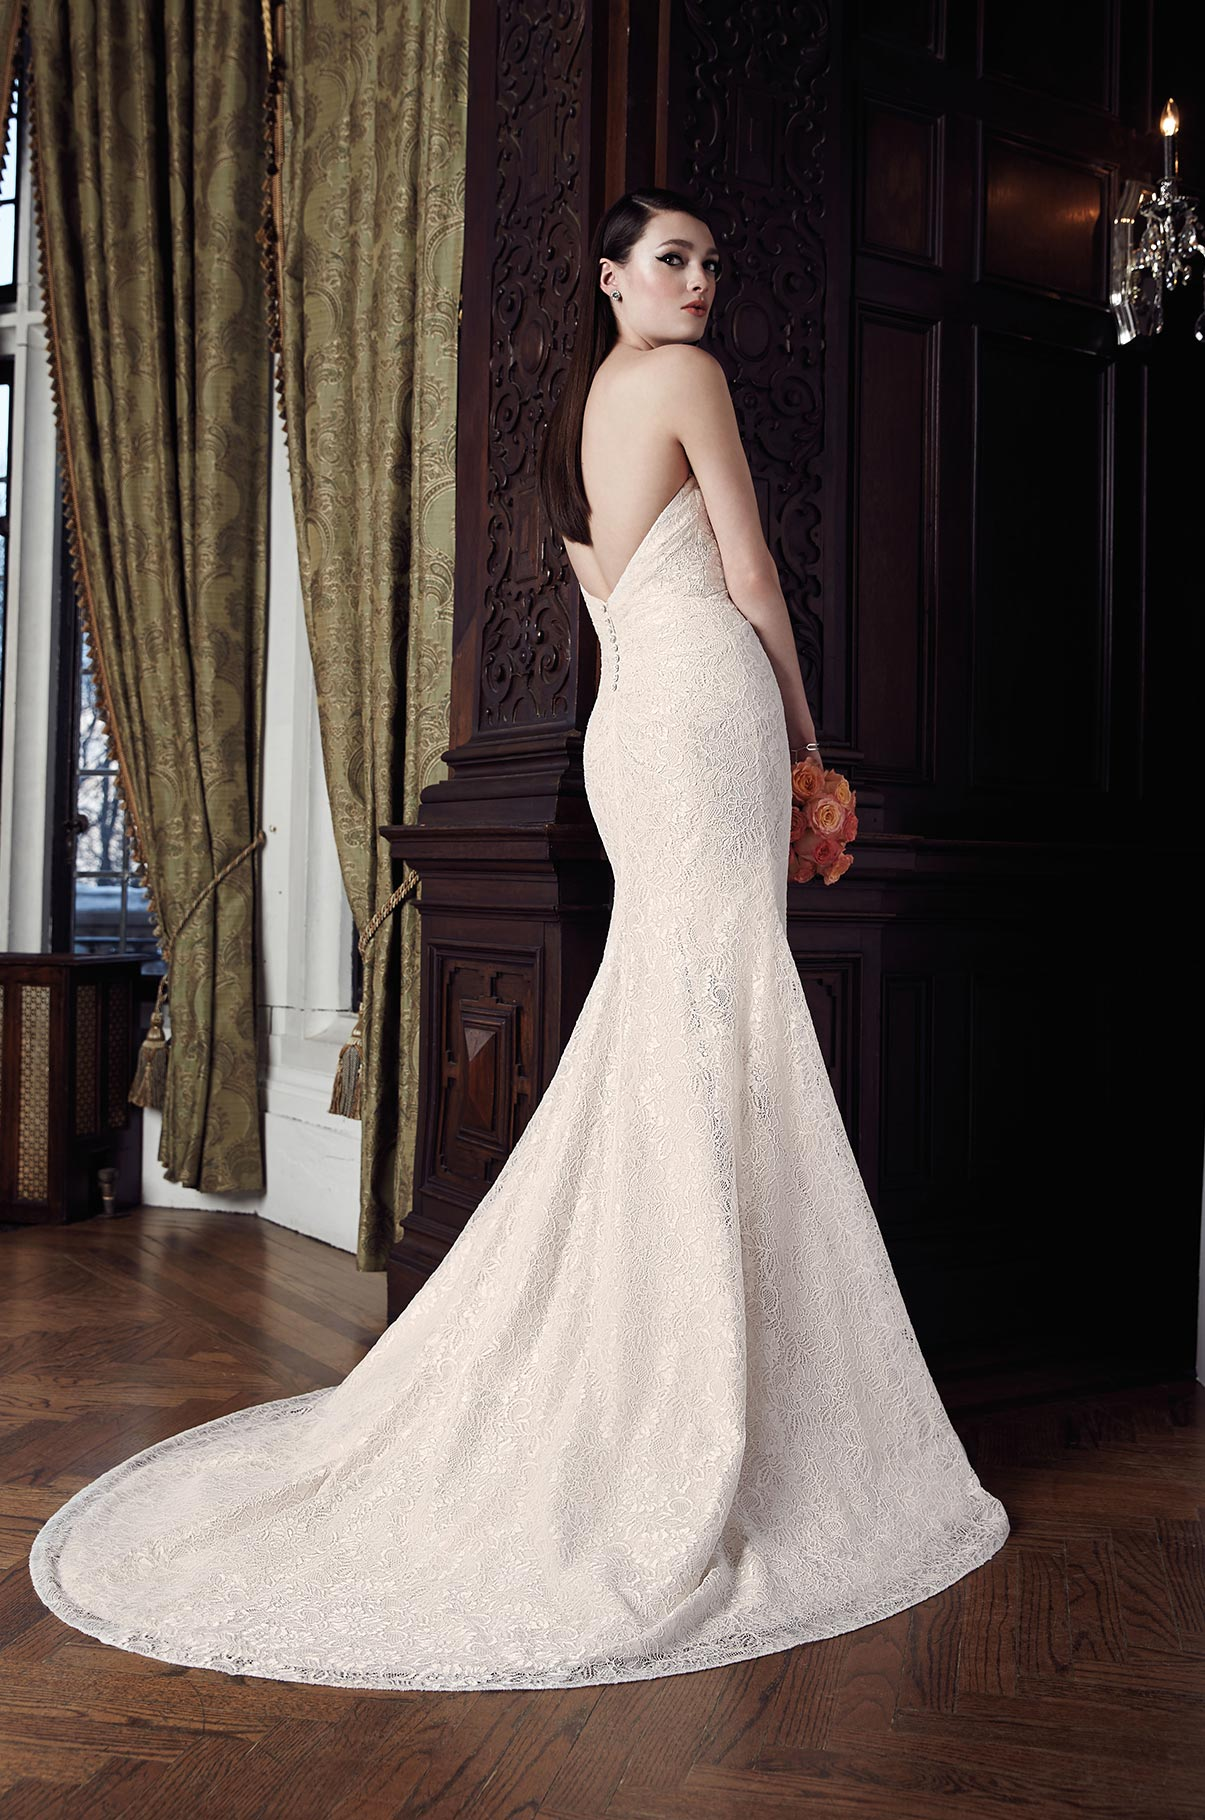 Lace Wedding Dress - Style #2017 | Mikaella Bridal